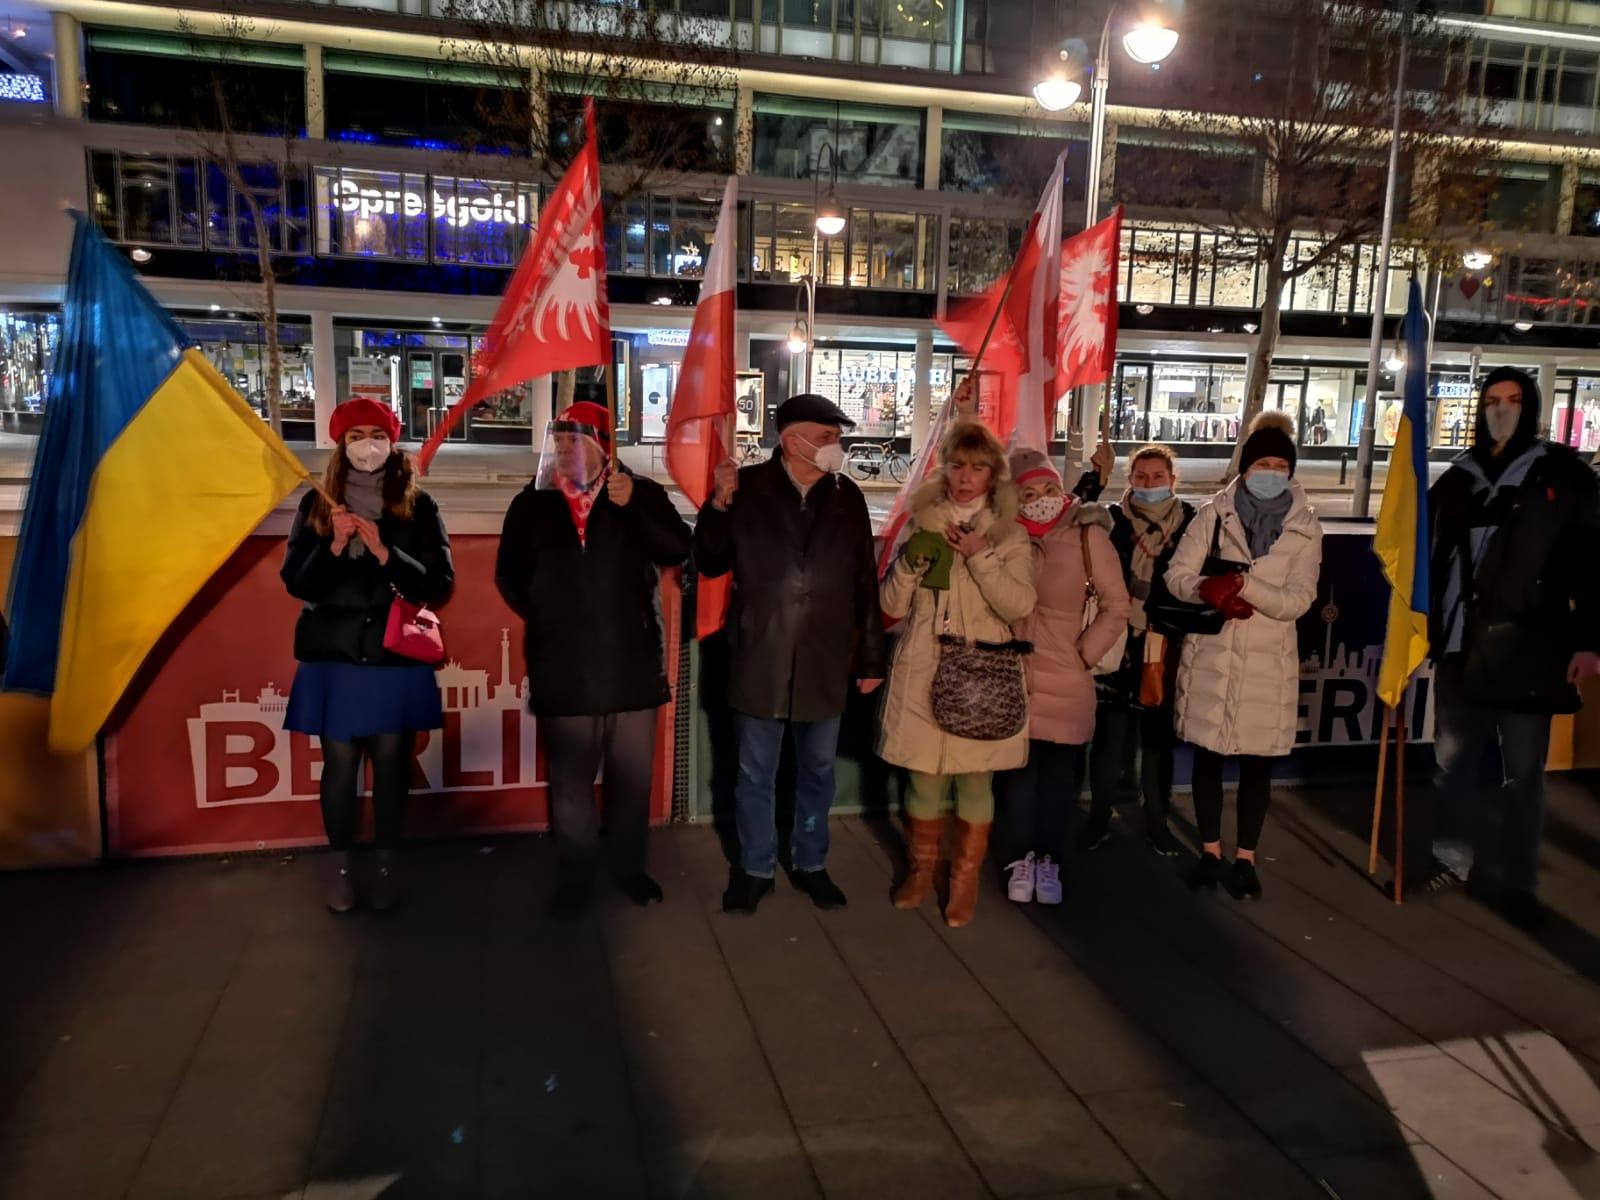 Berlin Brandenburg protest